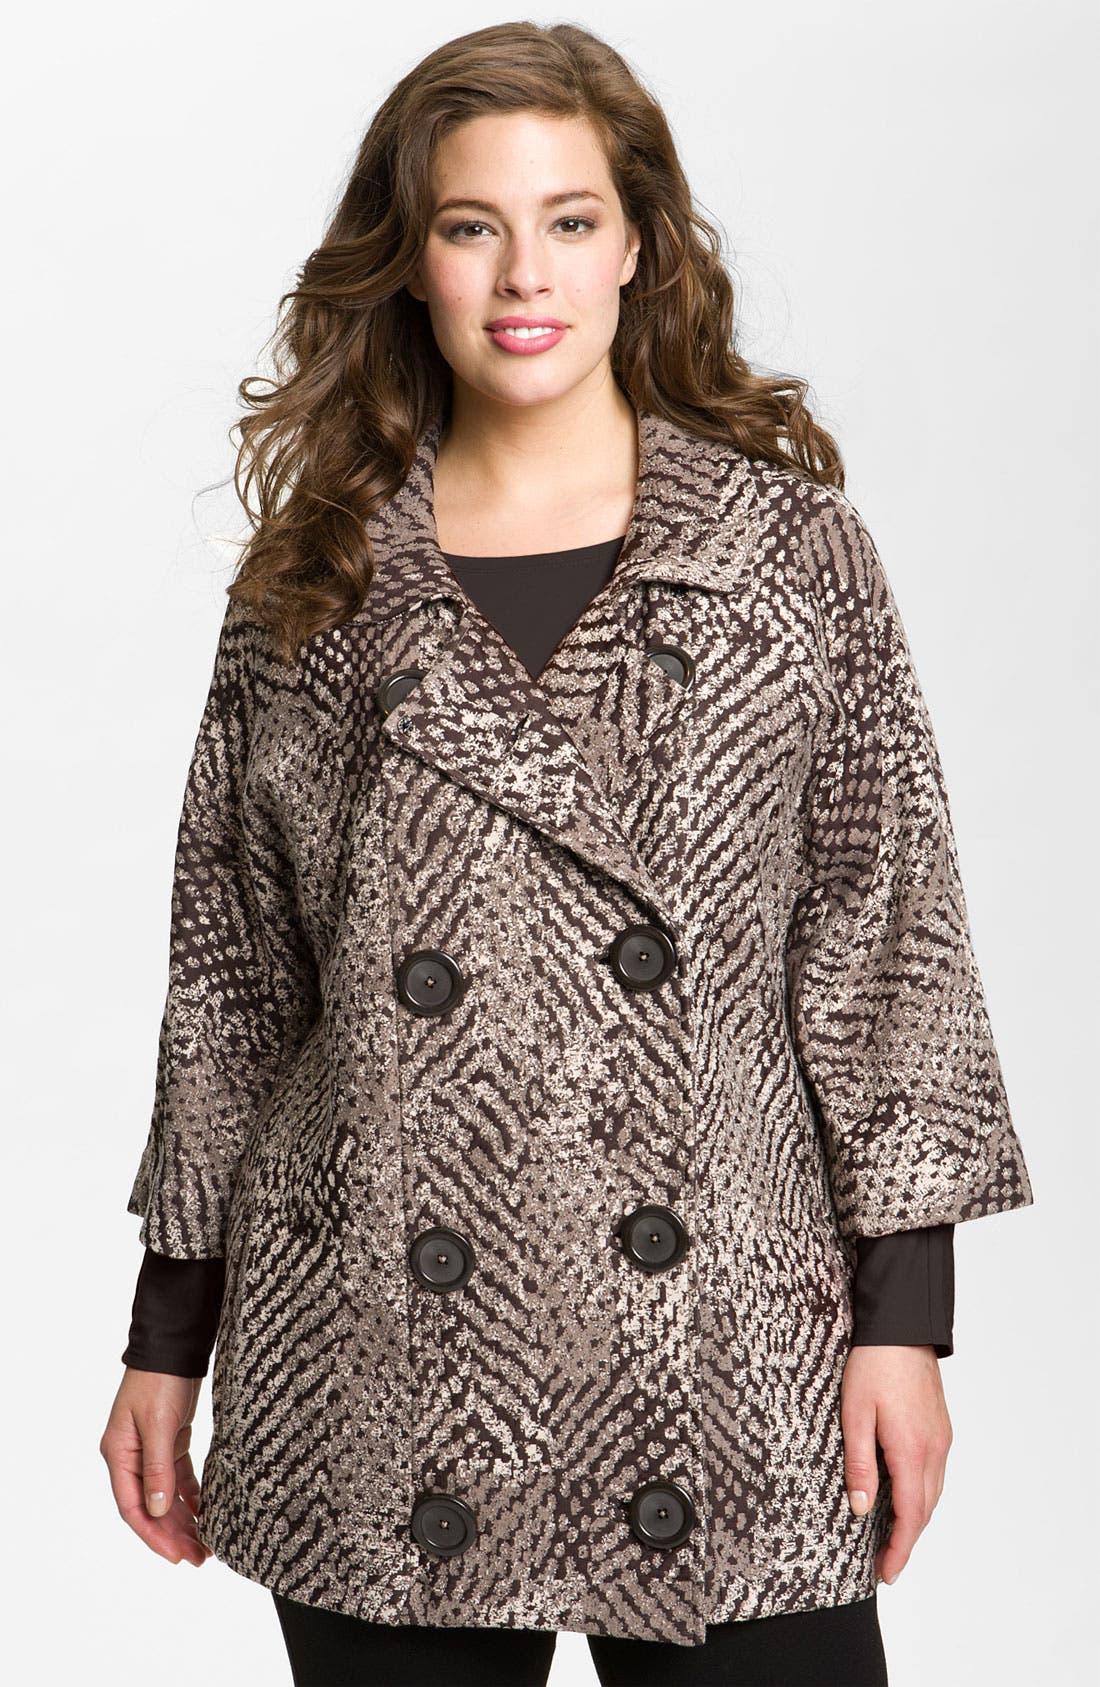 Main Image - Nic + Zoe 'Textured Dots' Knit Jacket (Plus)